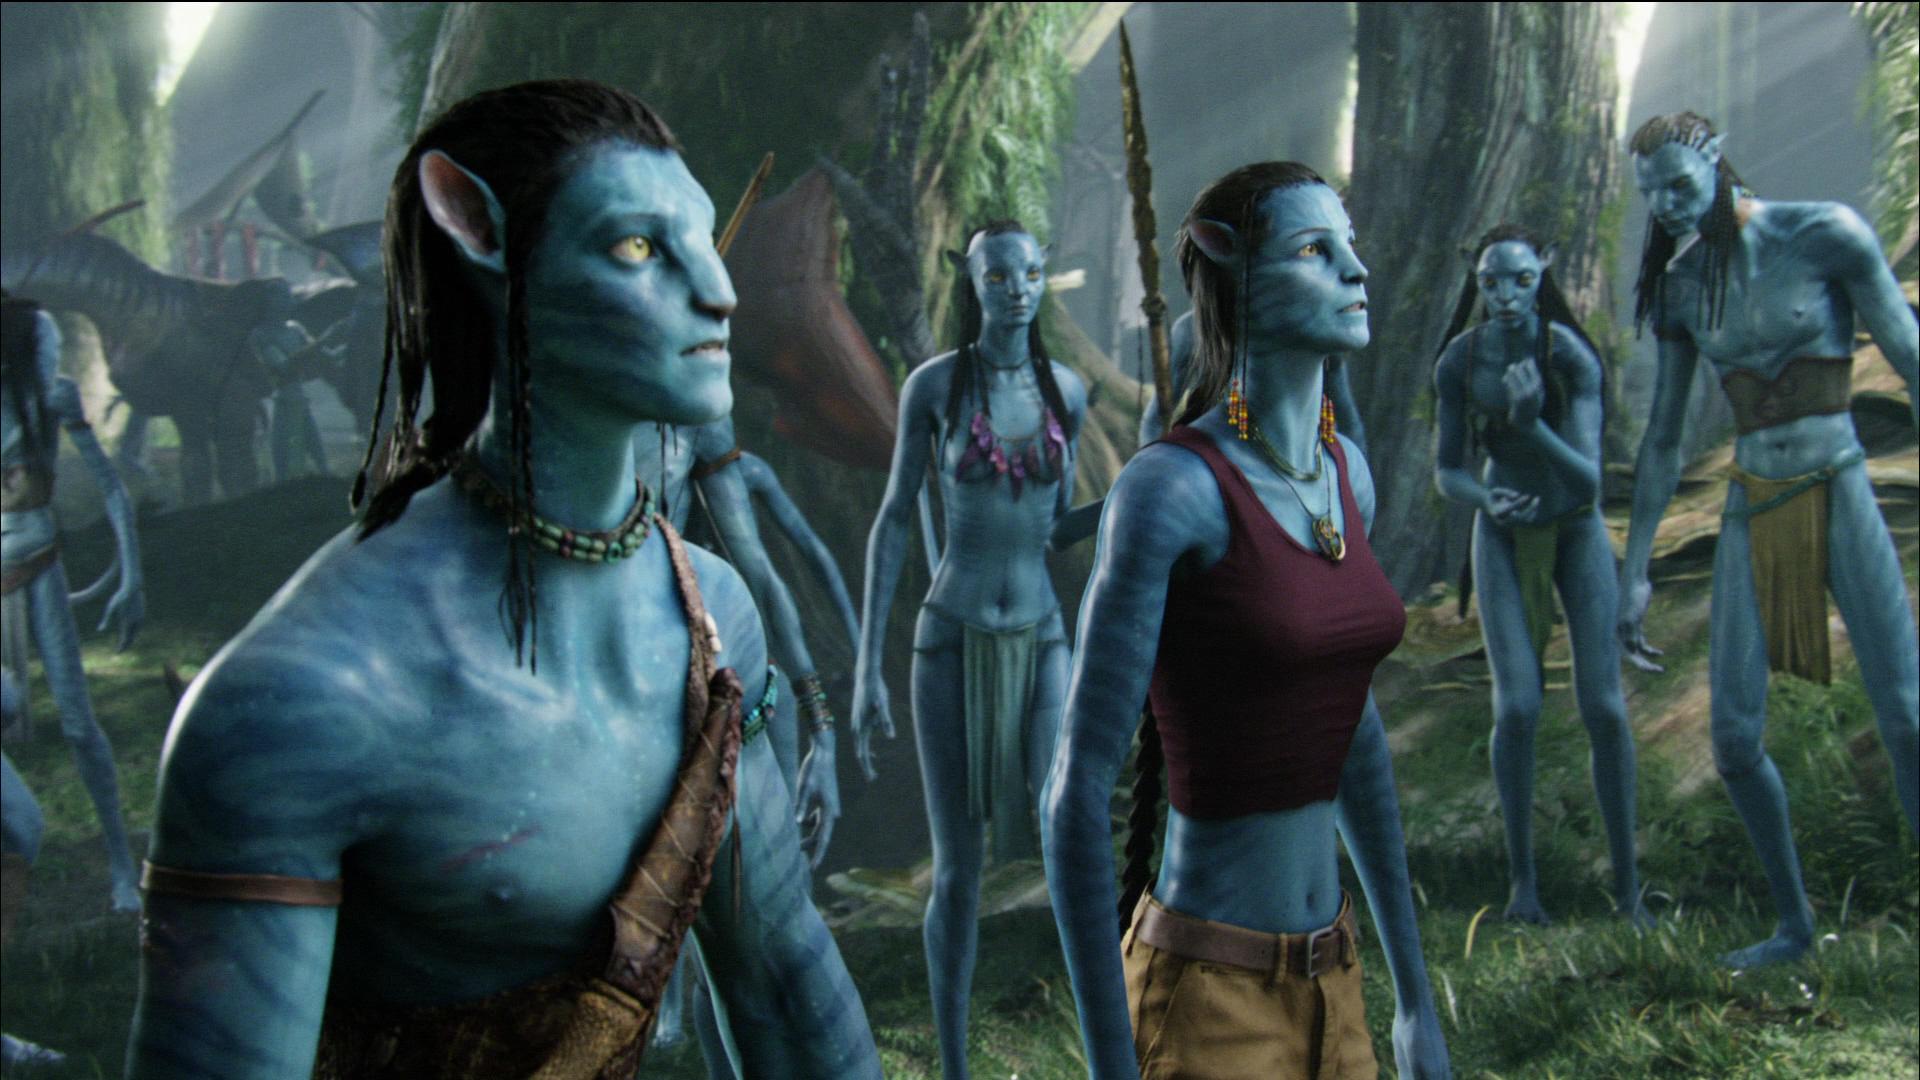 Is Avatar on Netflix, Hulu or Amazon Prime? - Cinemaholic